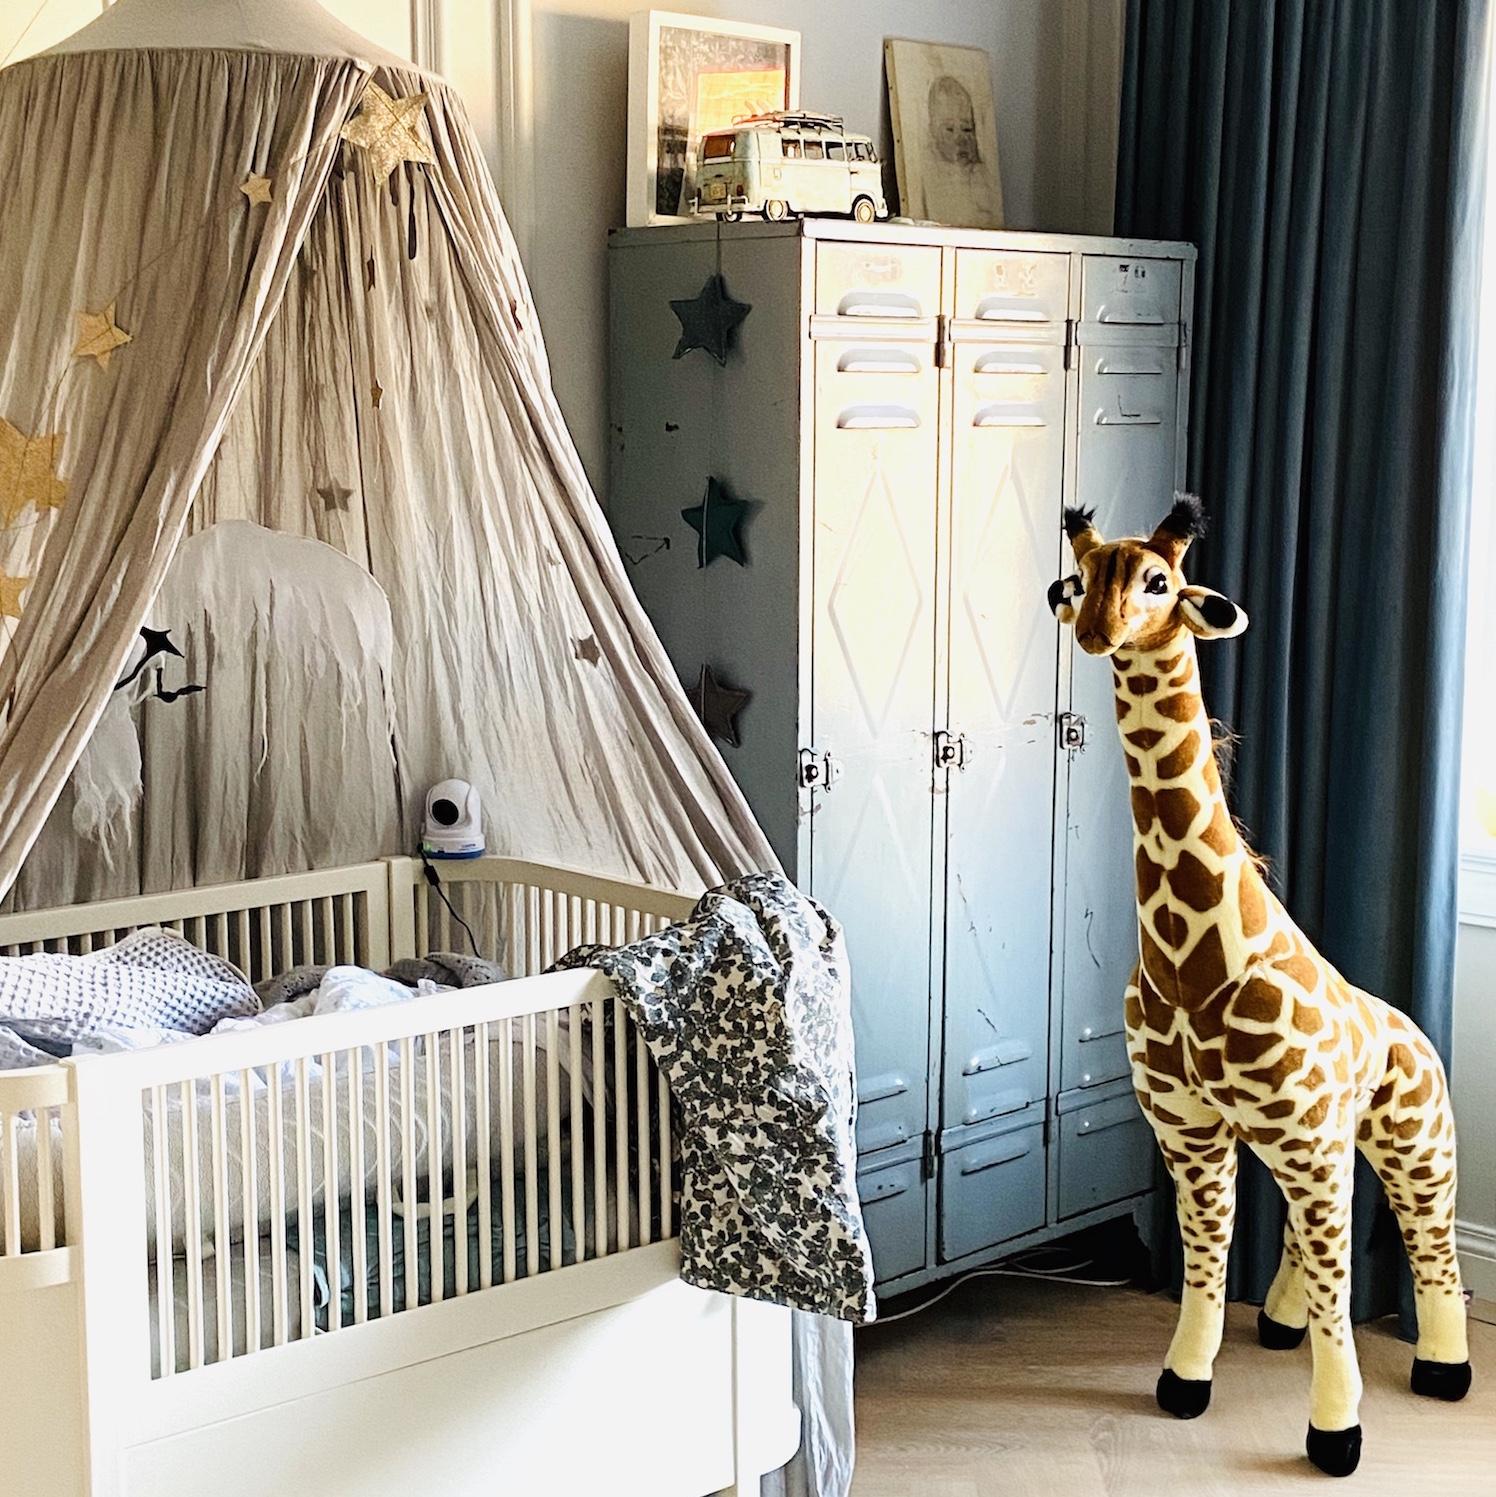 lijsten-babykamer